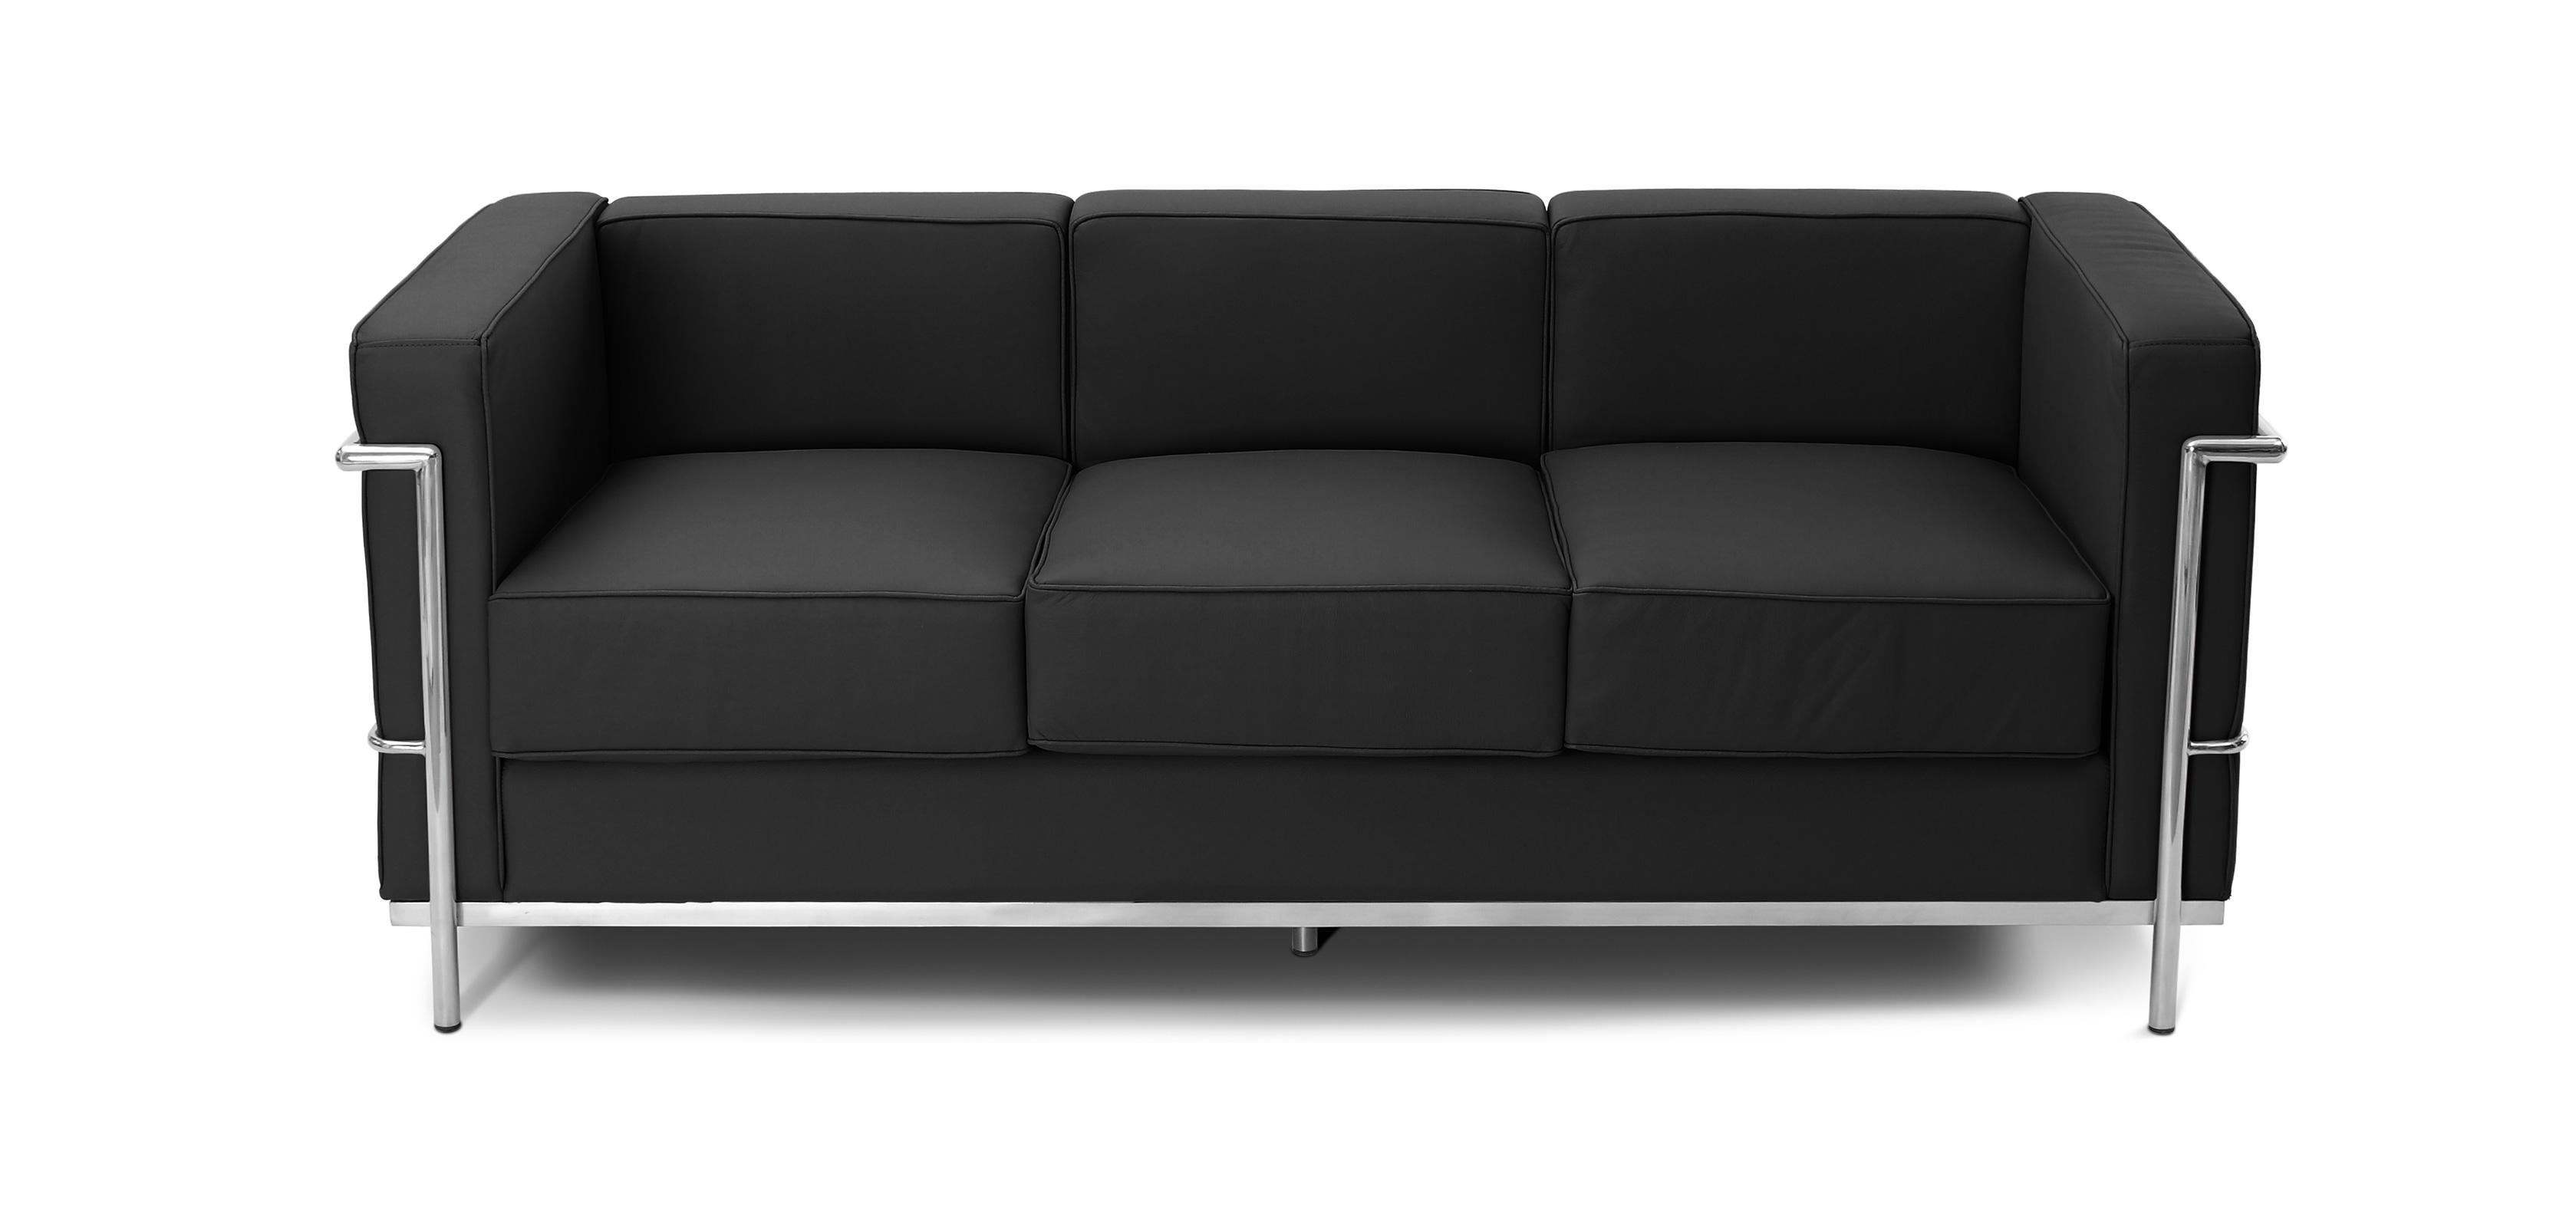 Canape Lc2 Charles Le Corbusier 3 Places Simili Cuir